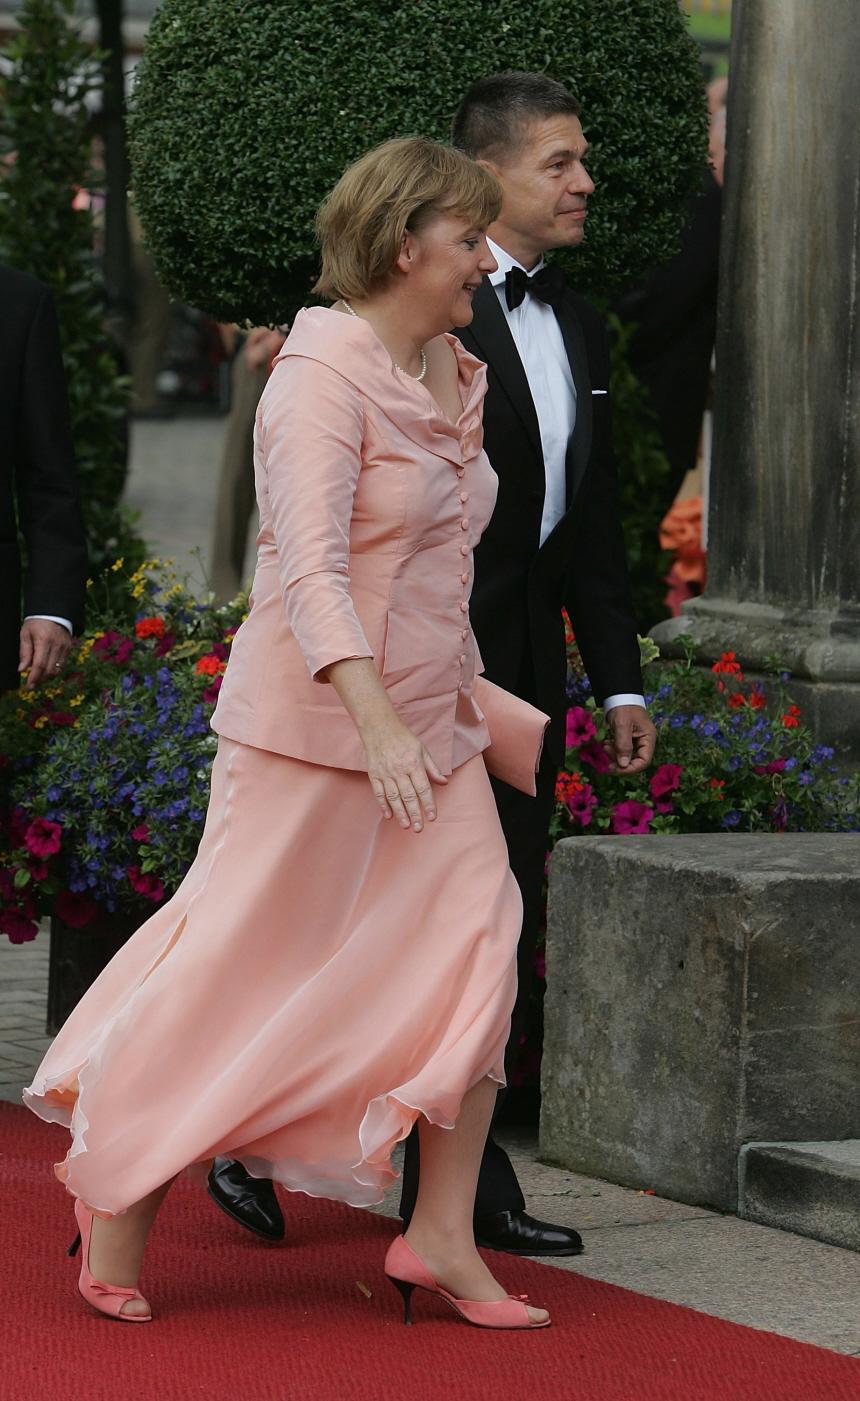 Feet Angela Merkel nude photos 2019